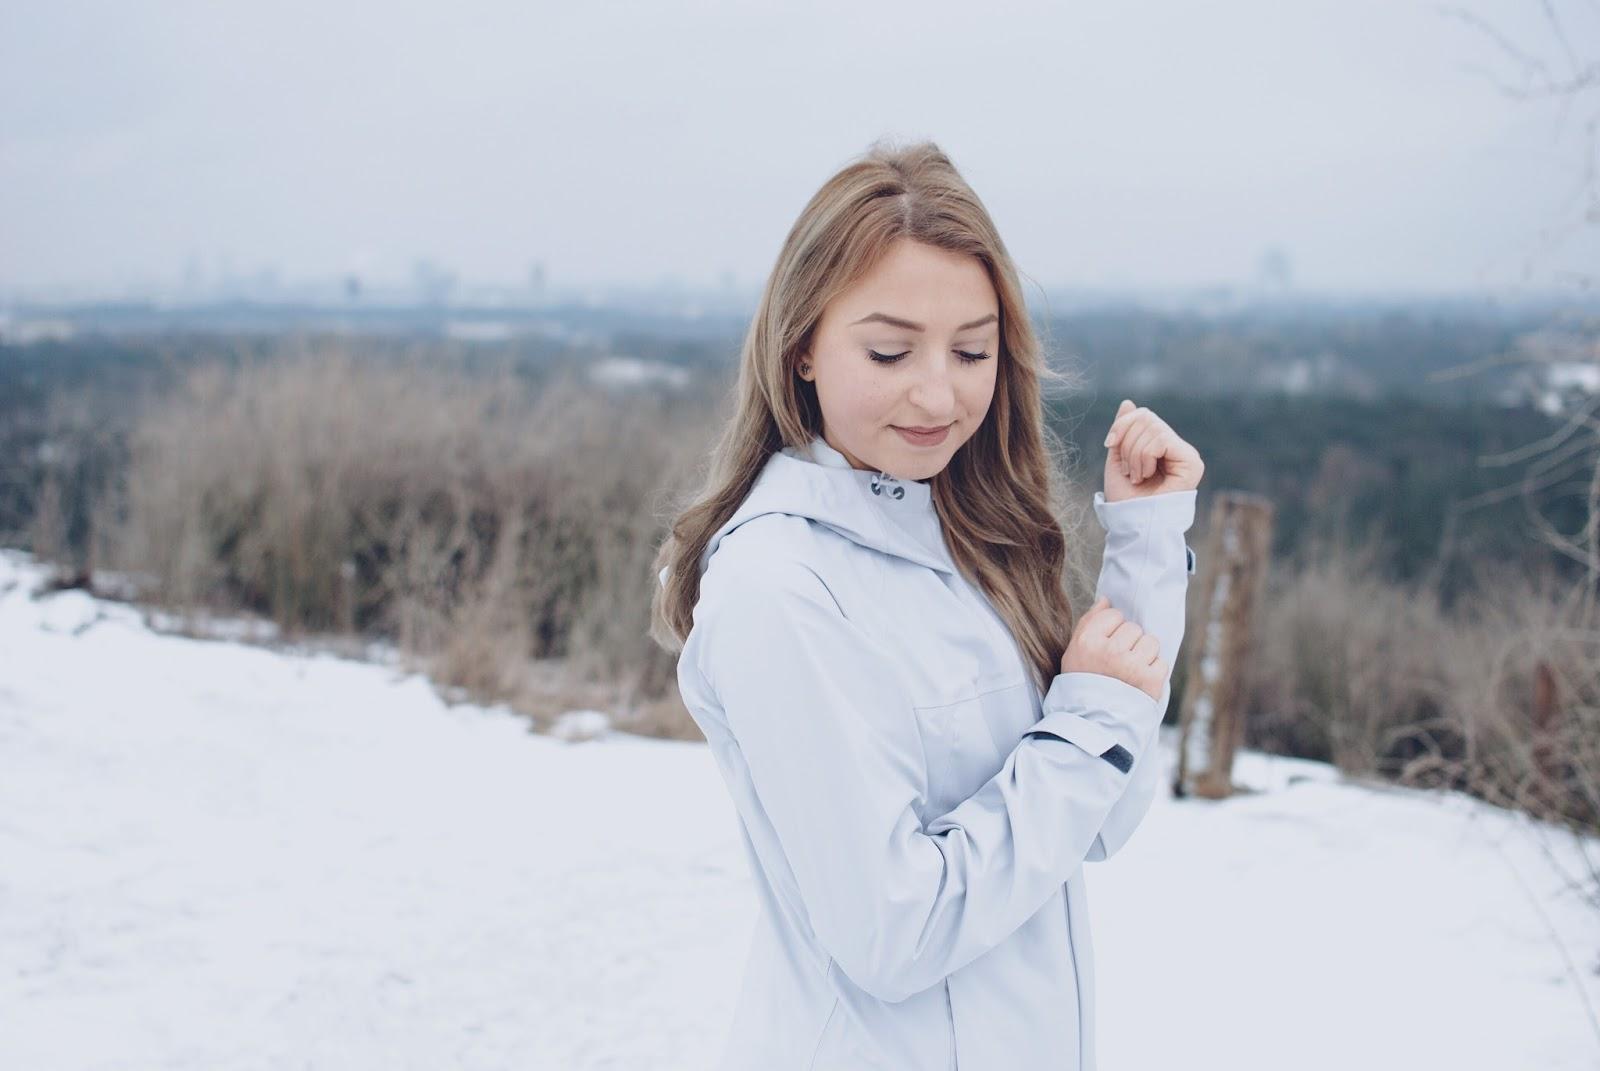 SNOW DAY STUNNER W/ UNIQLO SPORT